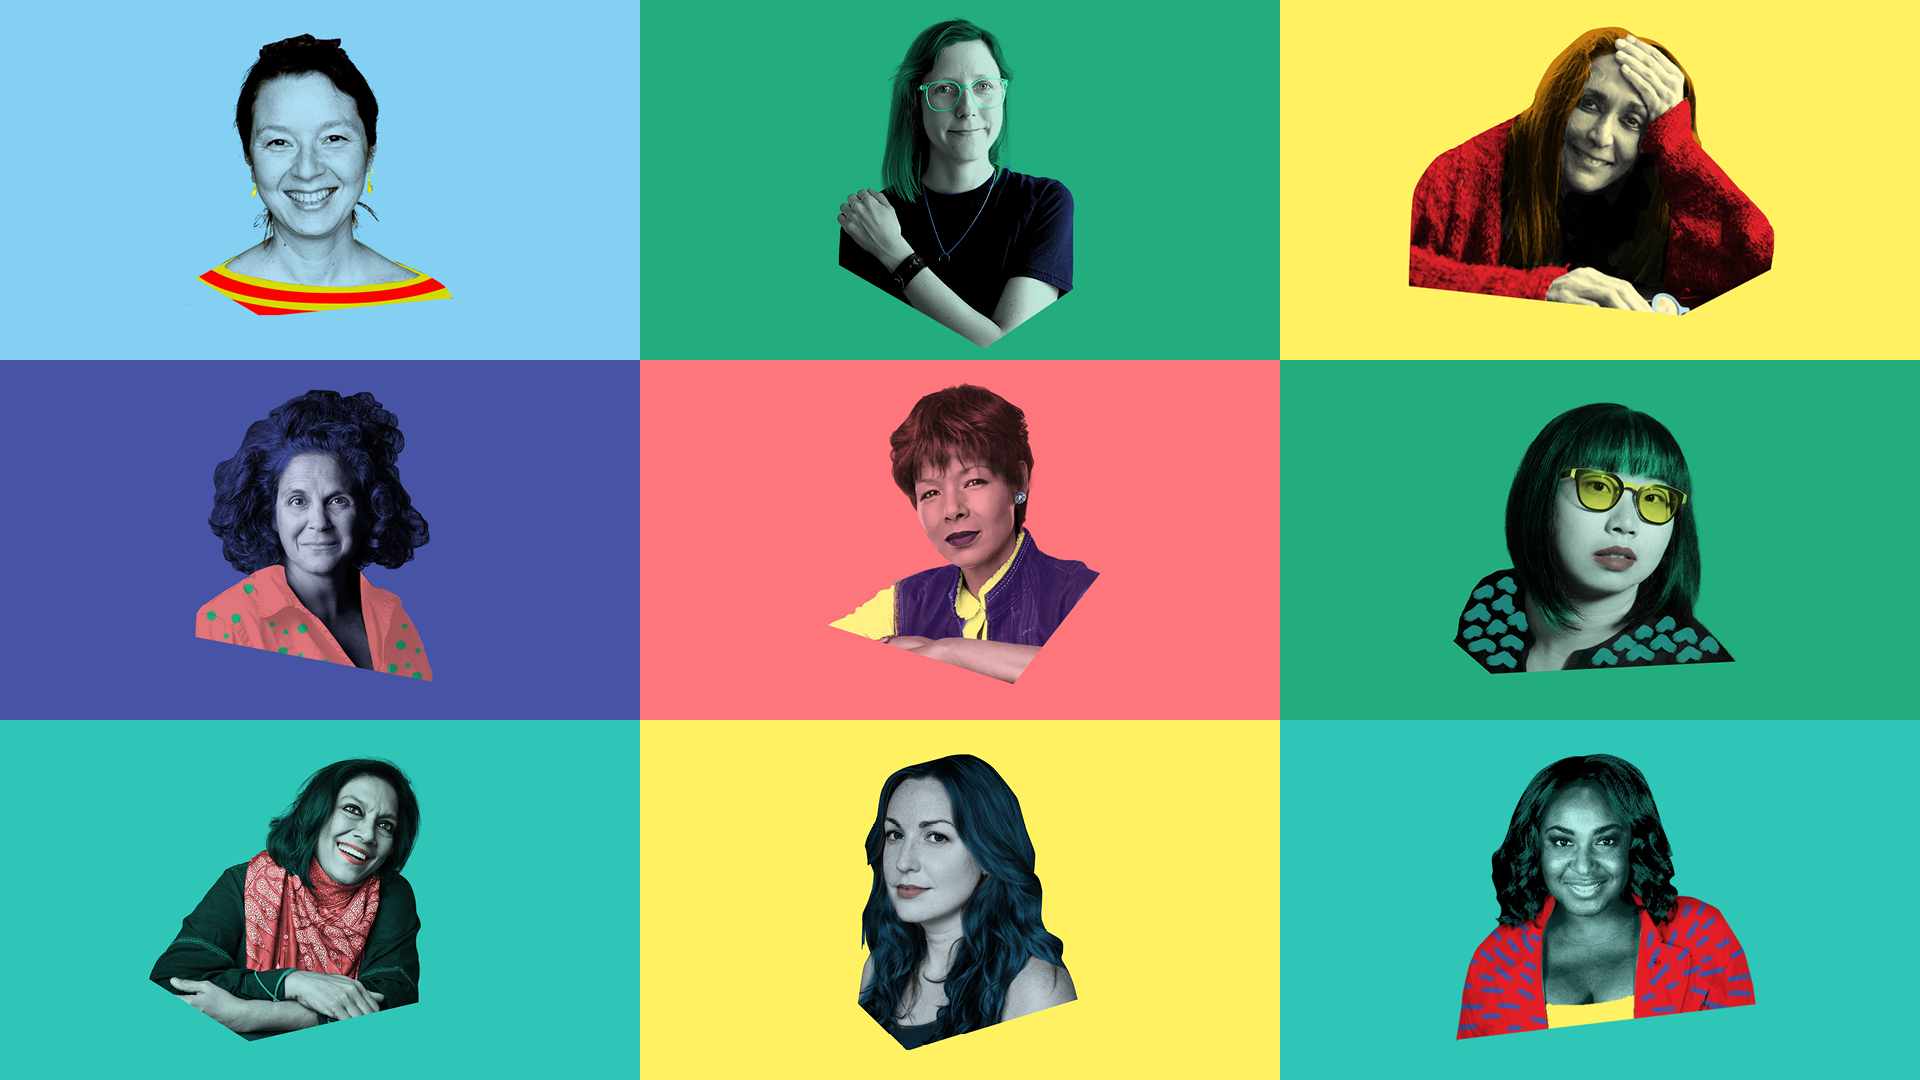 Pop art grid of women in film on coloured backgrounds.